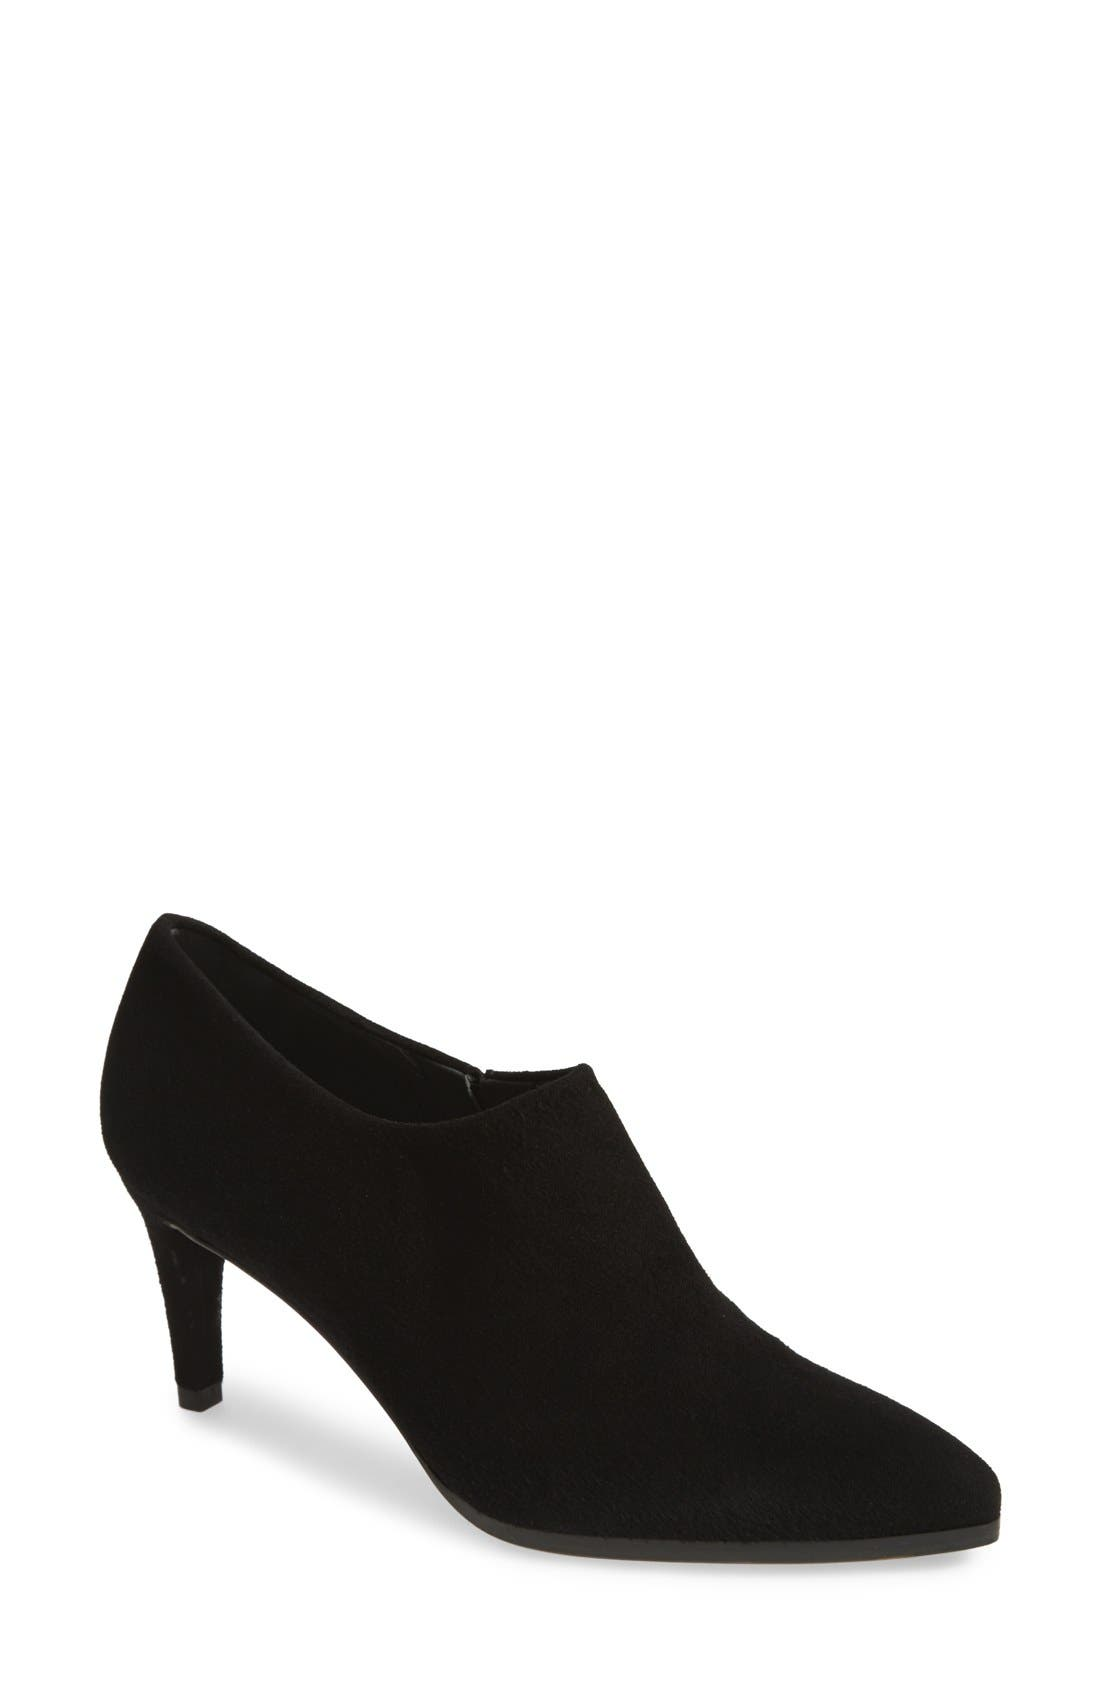 Alternate Image 1 Selected - Stuart Weitzman 'Standin' Leather Ankle Bootie (Women)